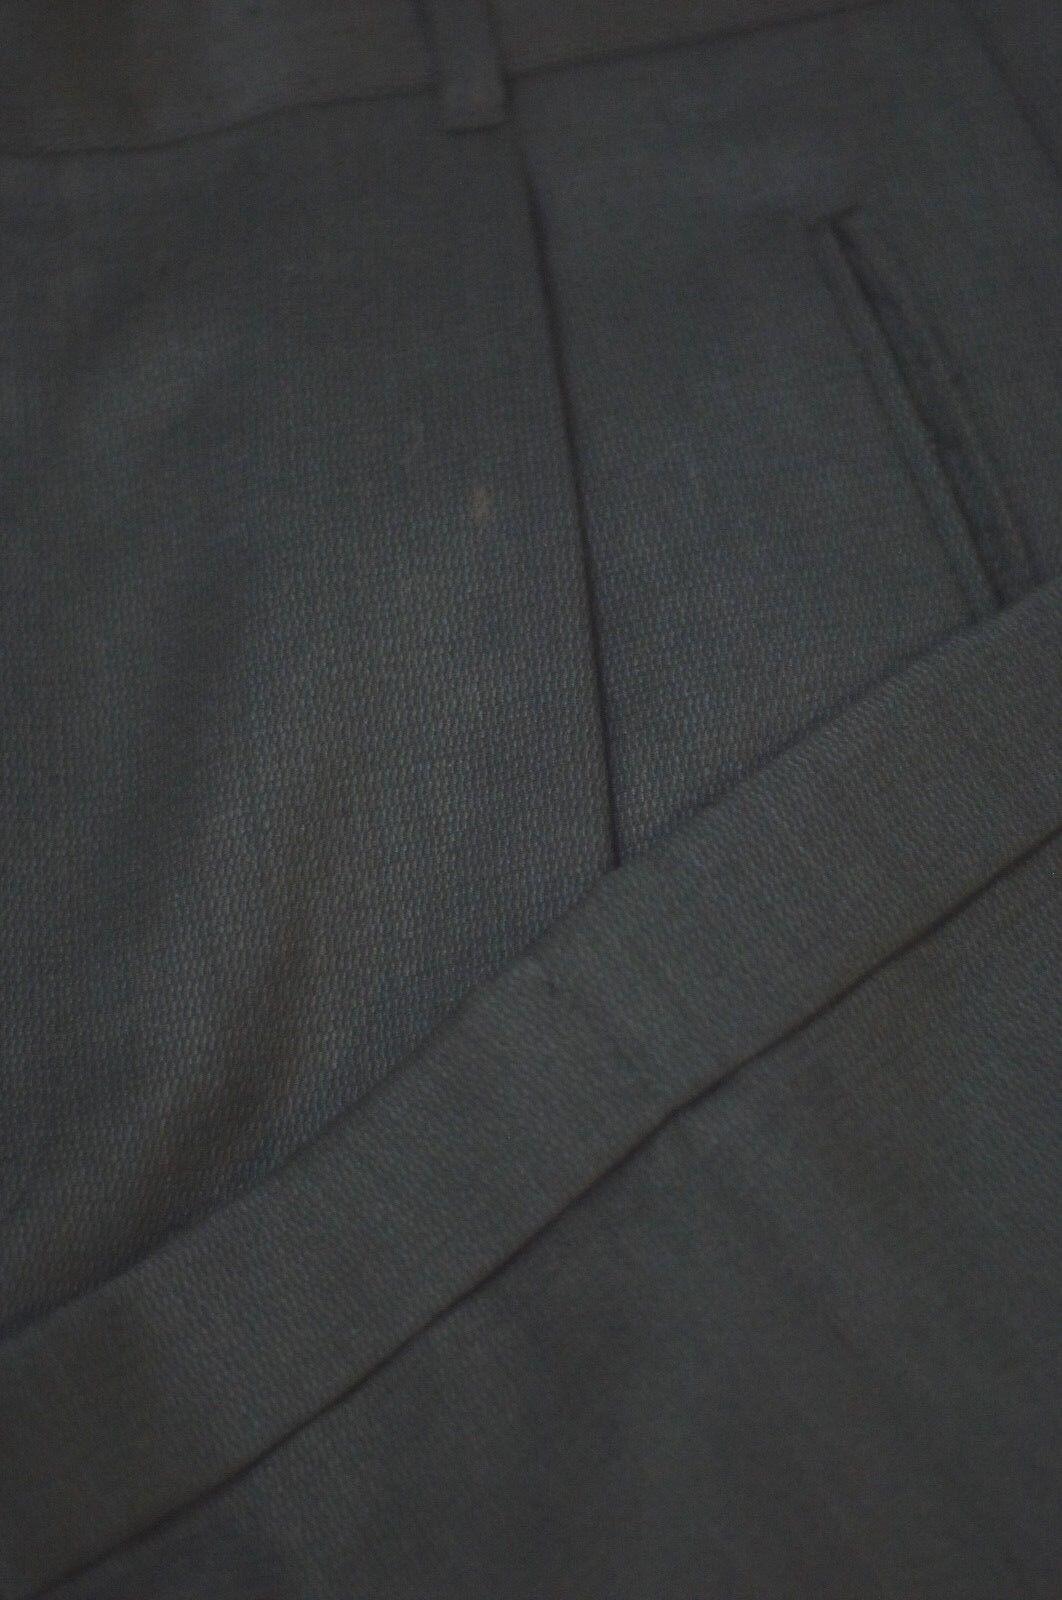 Riviera Riviera Riviera Uomo Grigio Nero Increspatura Weave Lana Lusso Pantaloni Eleganti 32 X cba5dd